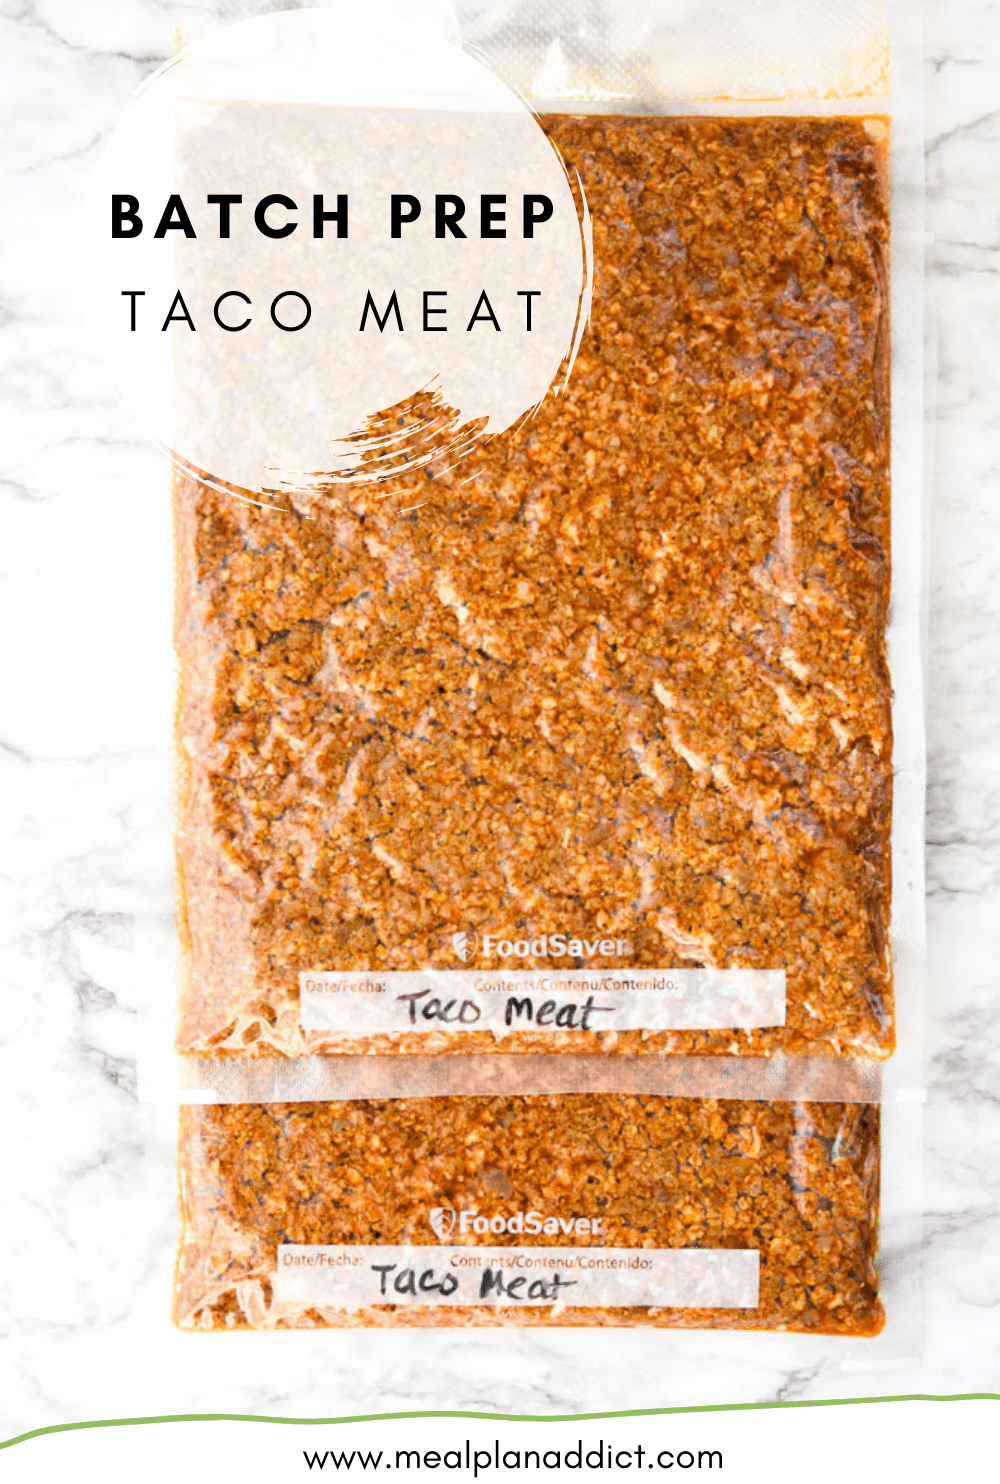 Batch Prep Taco Meat